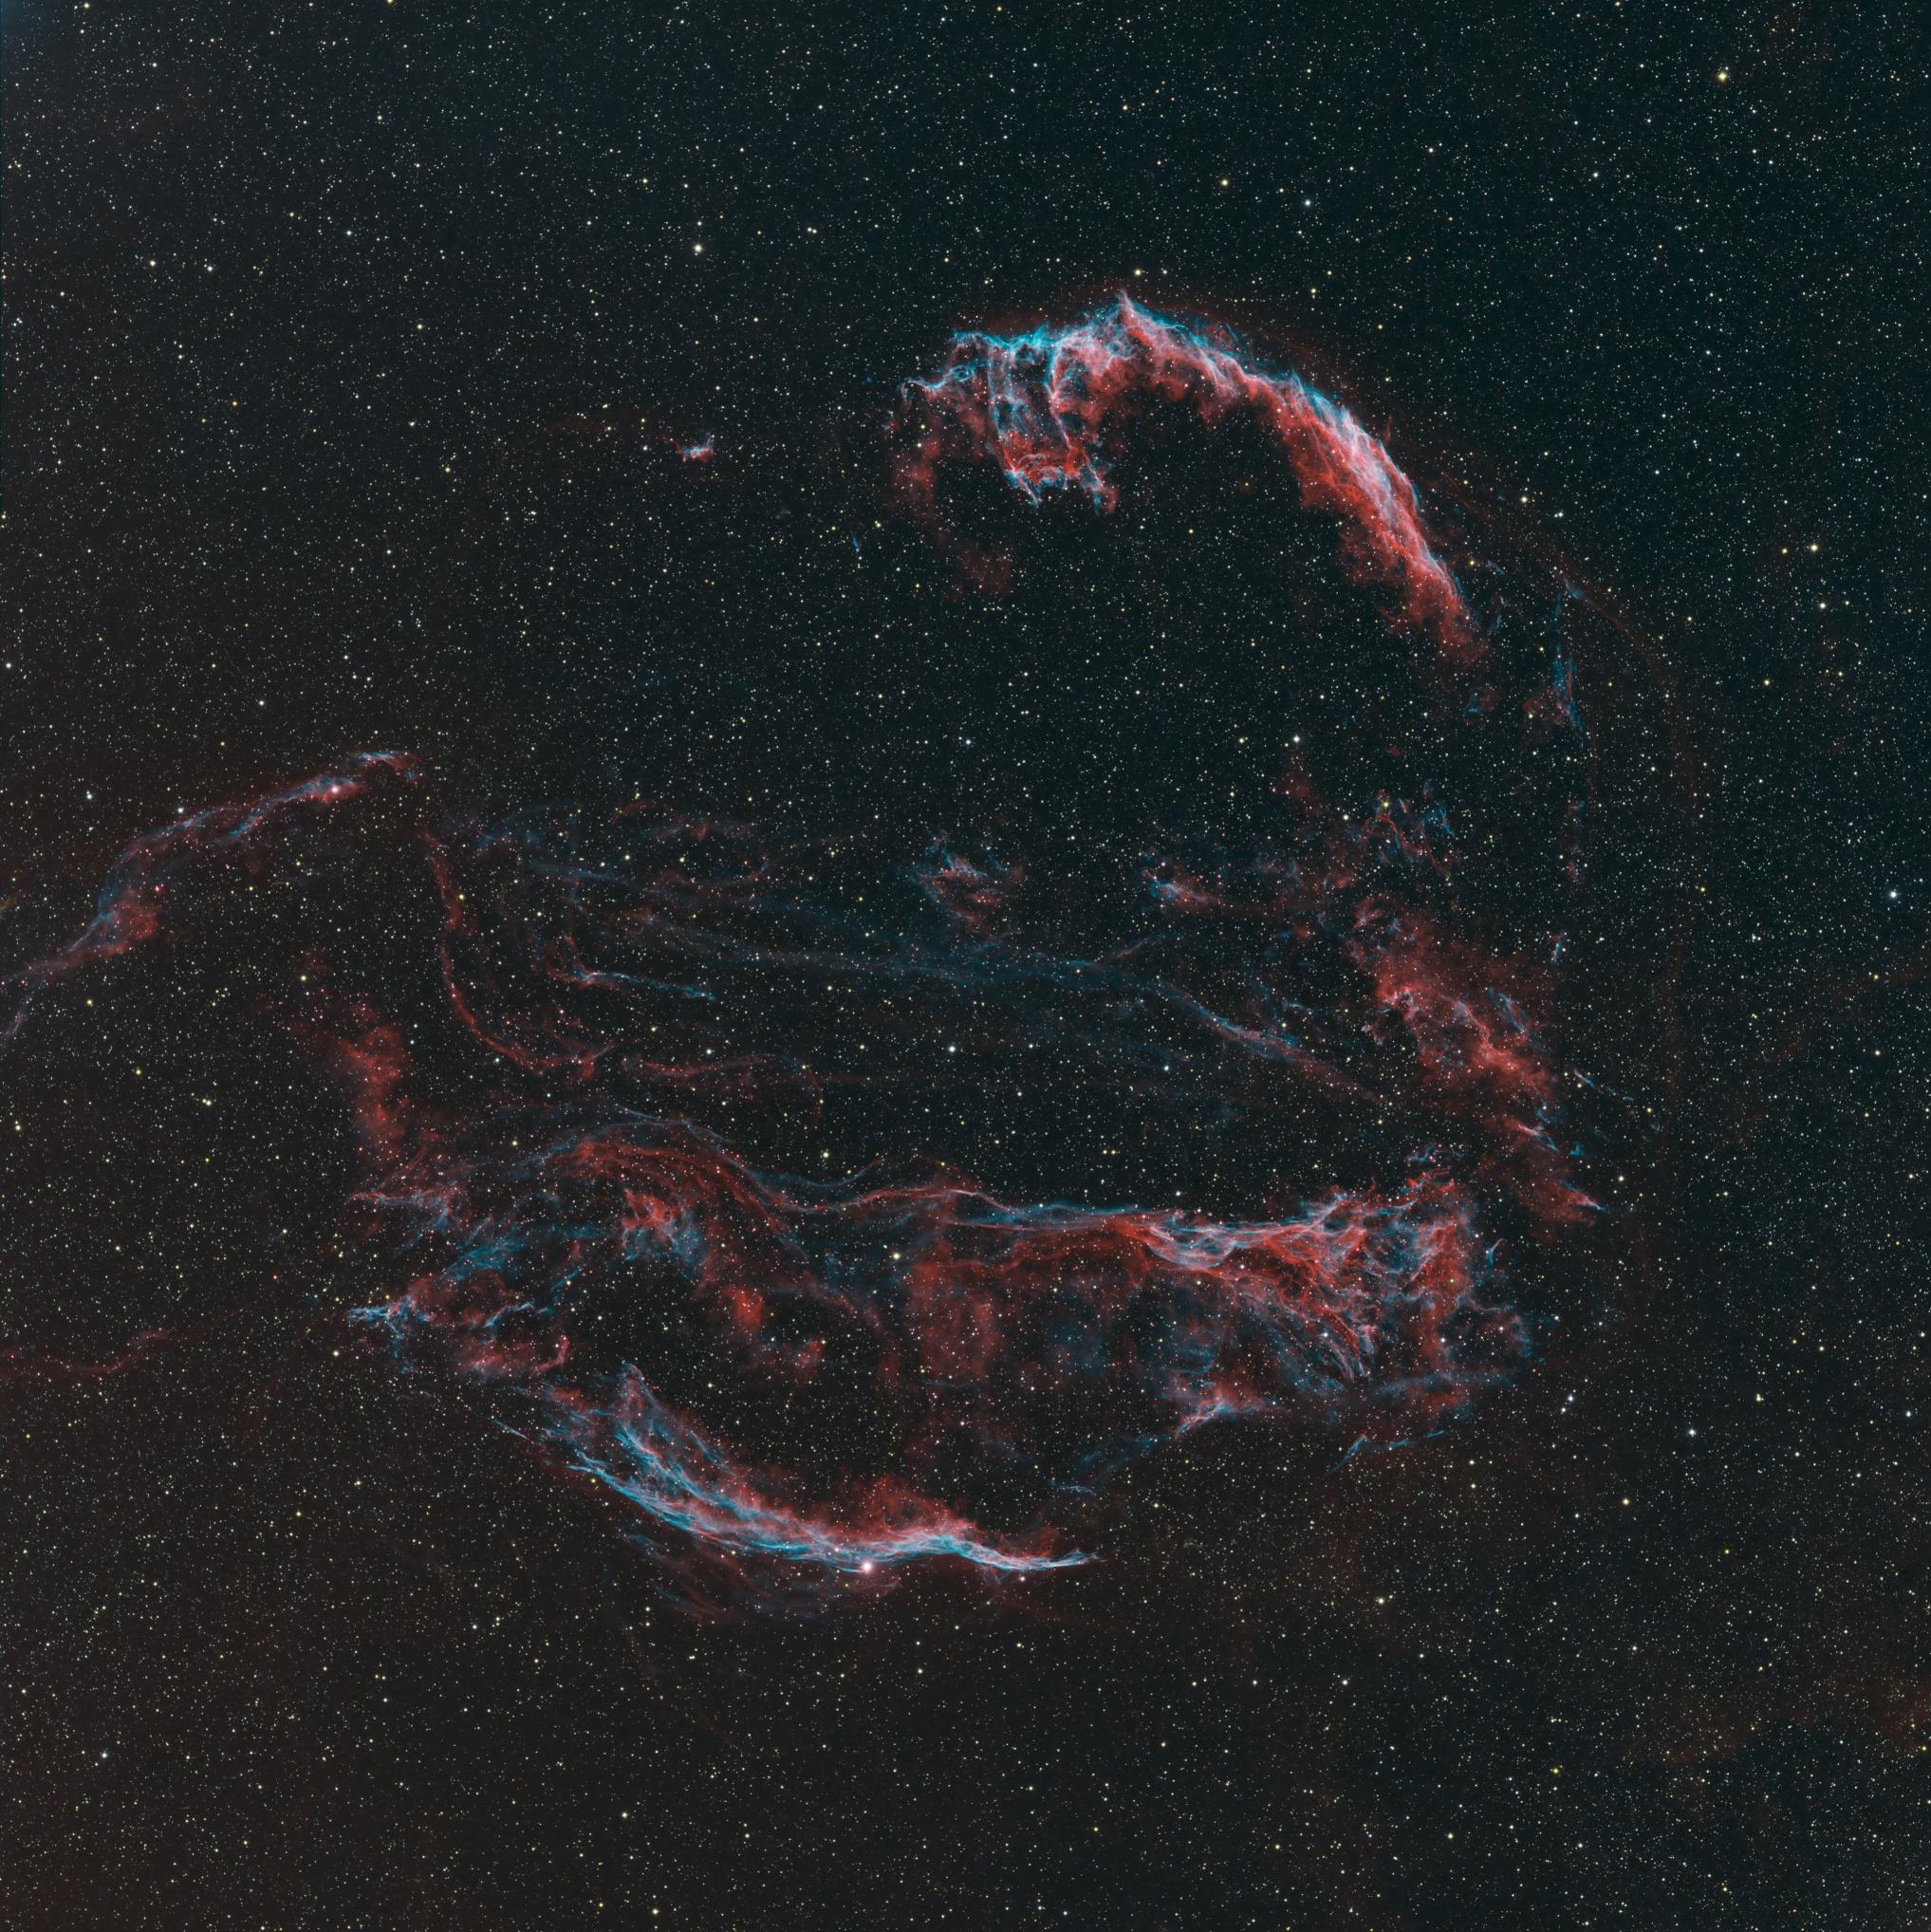 Apod 2010 September 16 The Veil Nebula